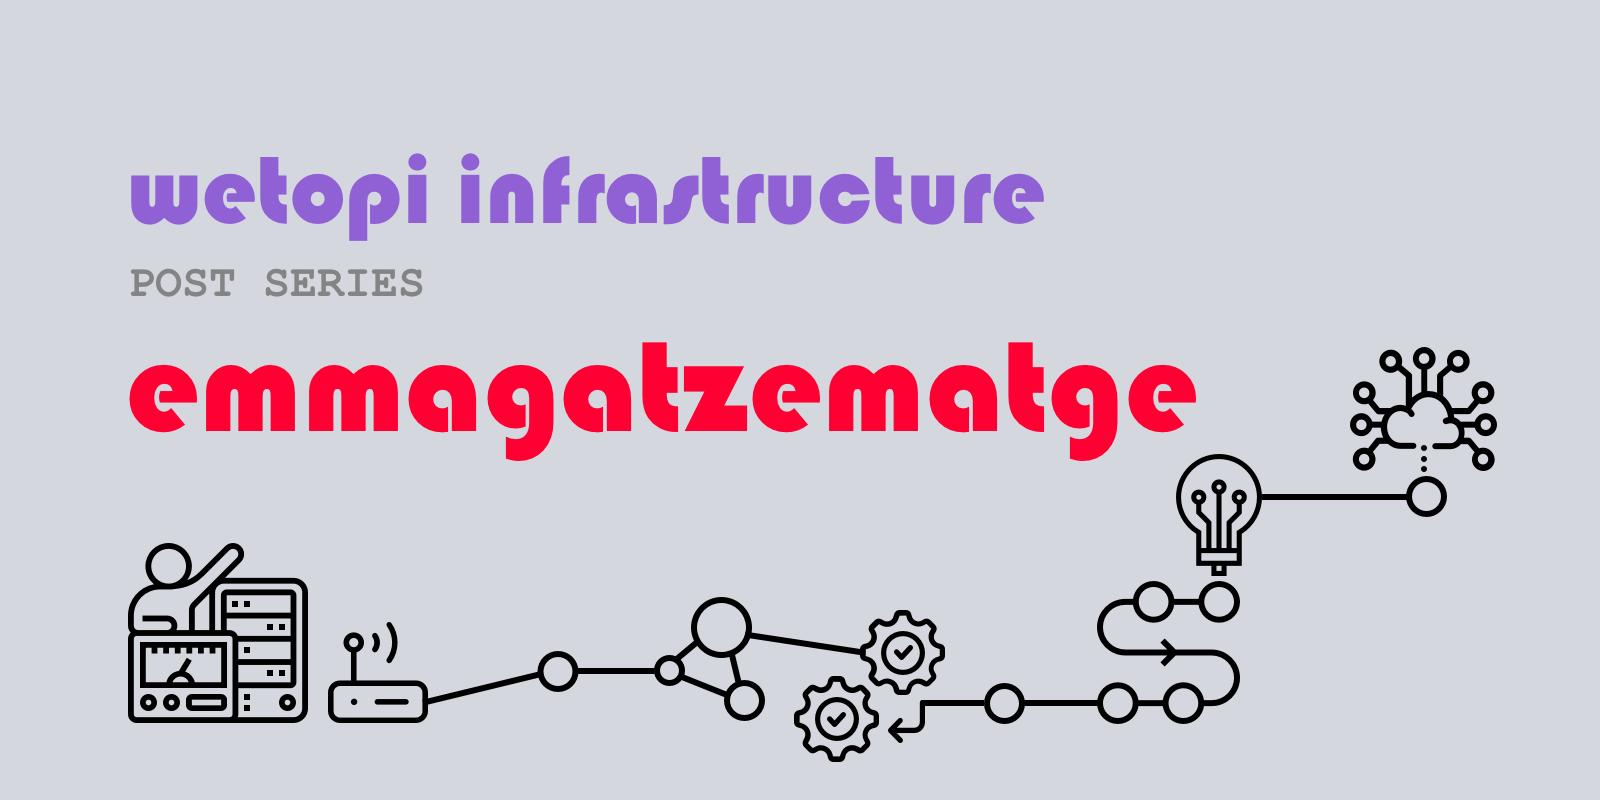 wetopi-infrastructure-emmagatzematge.png